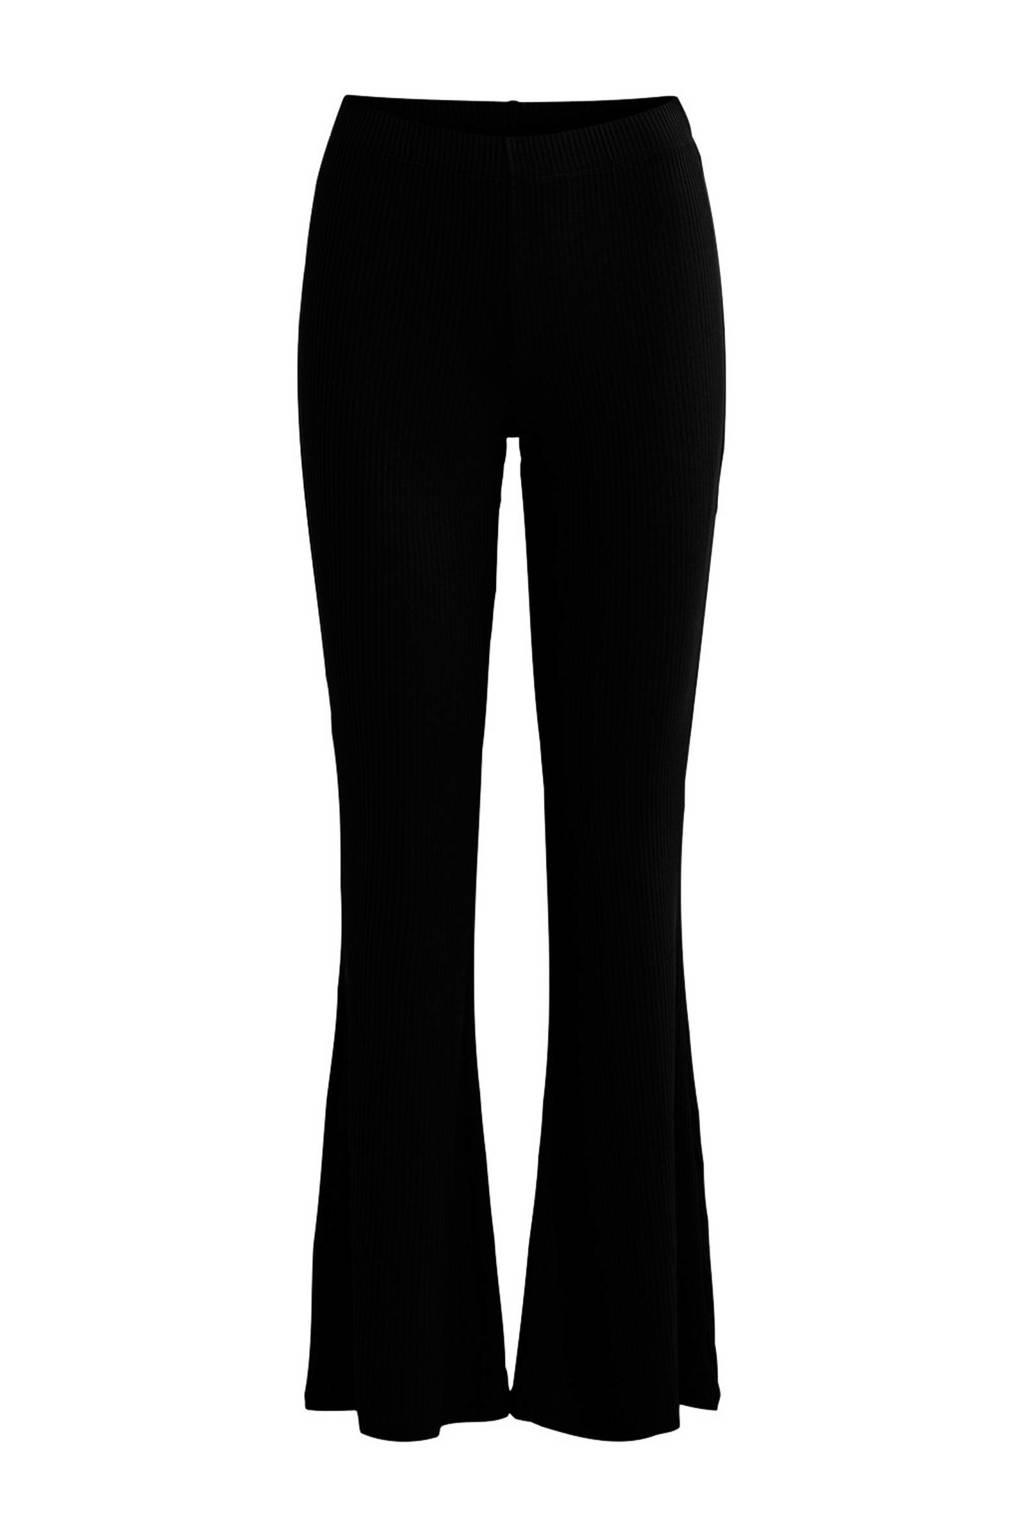 OBJECT flared broek zwart, Zwart